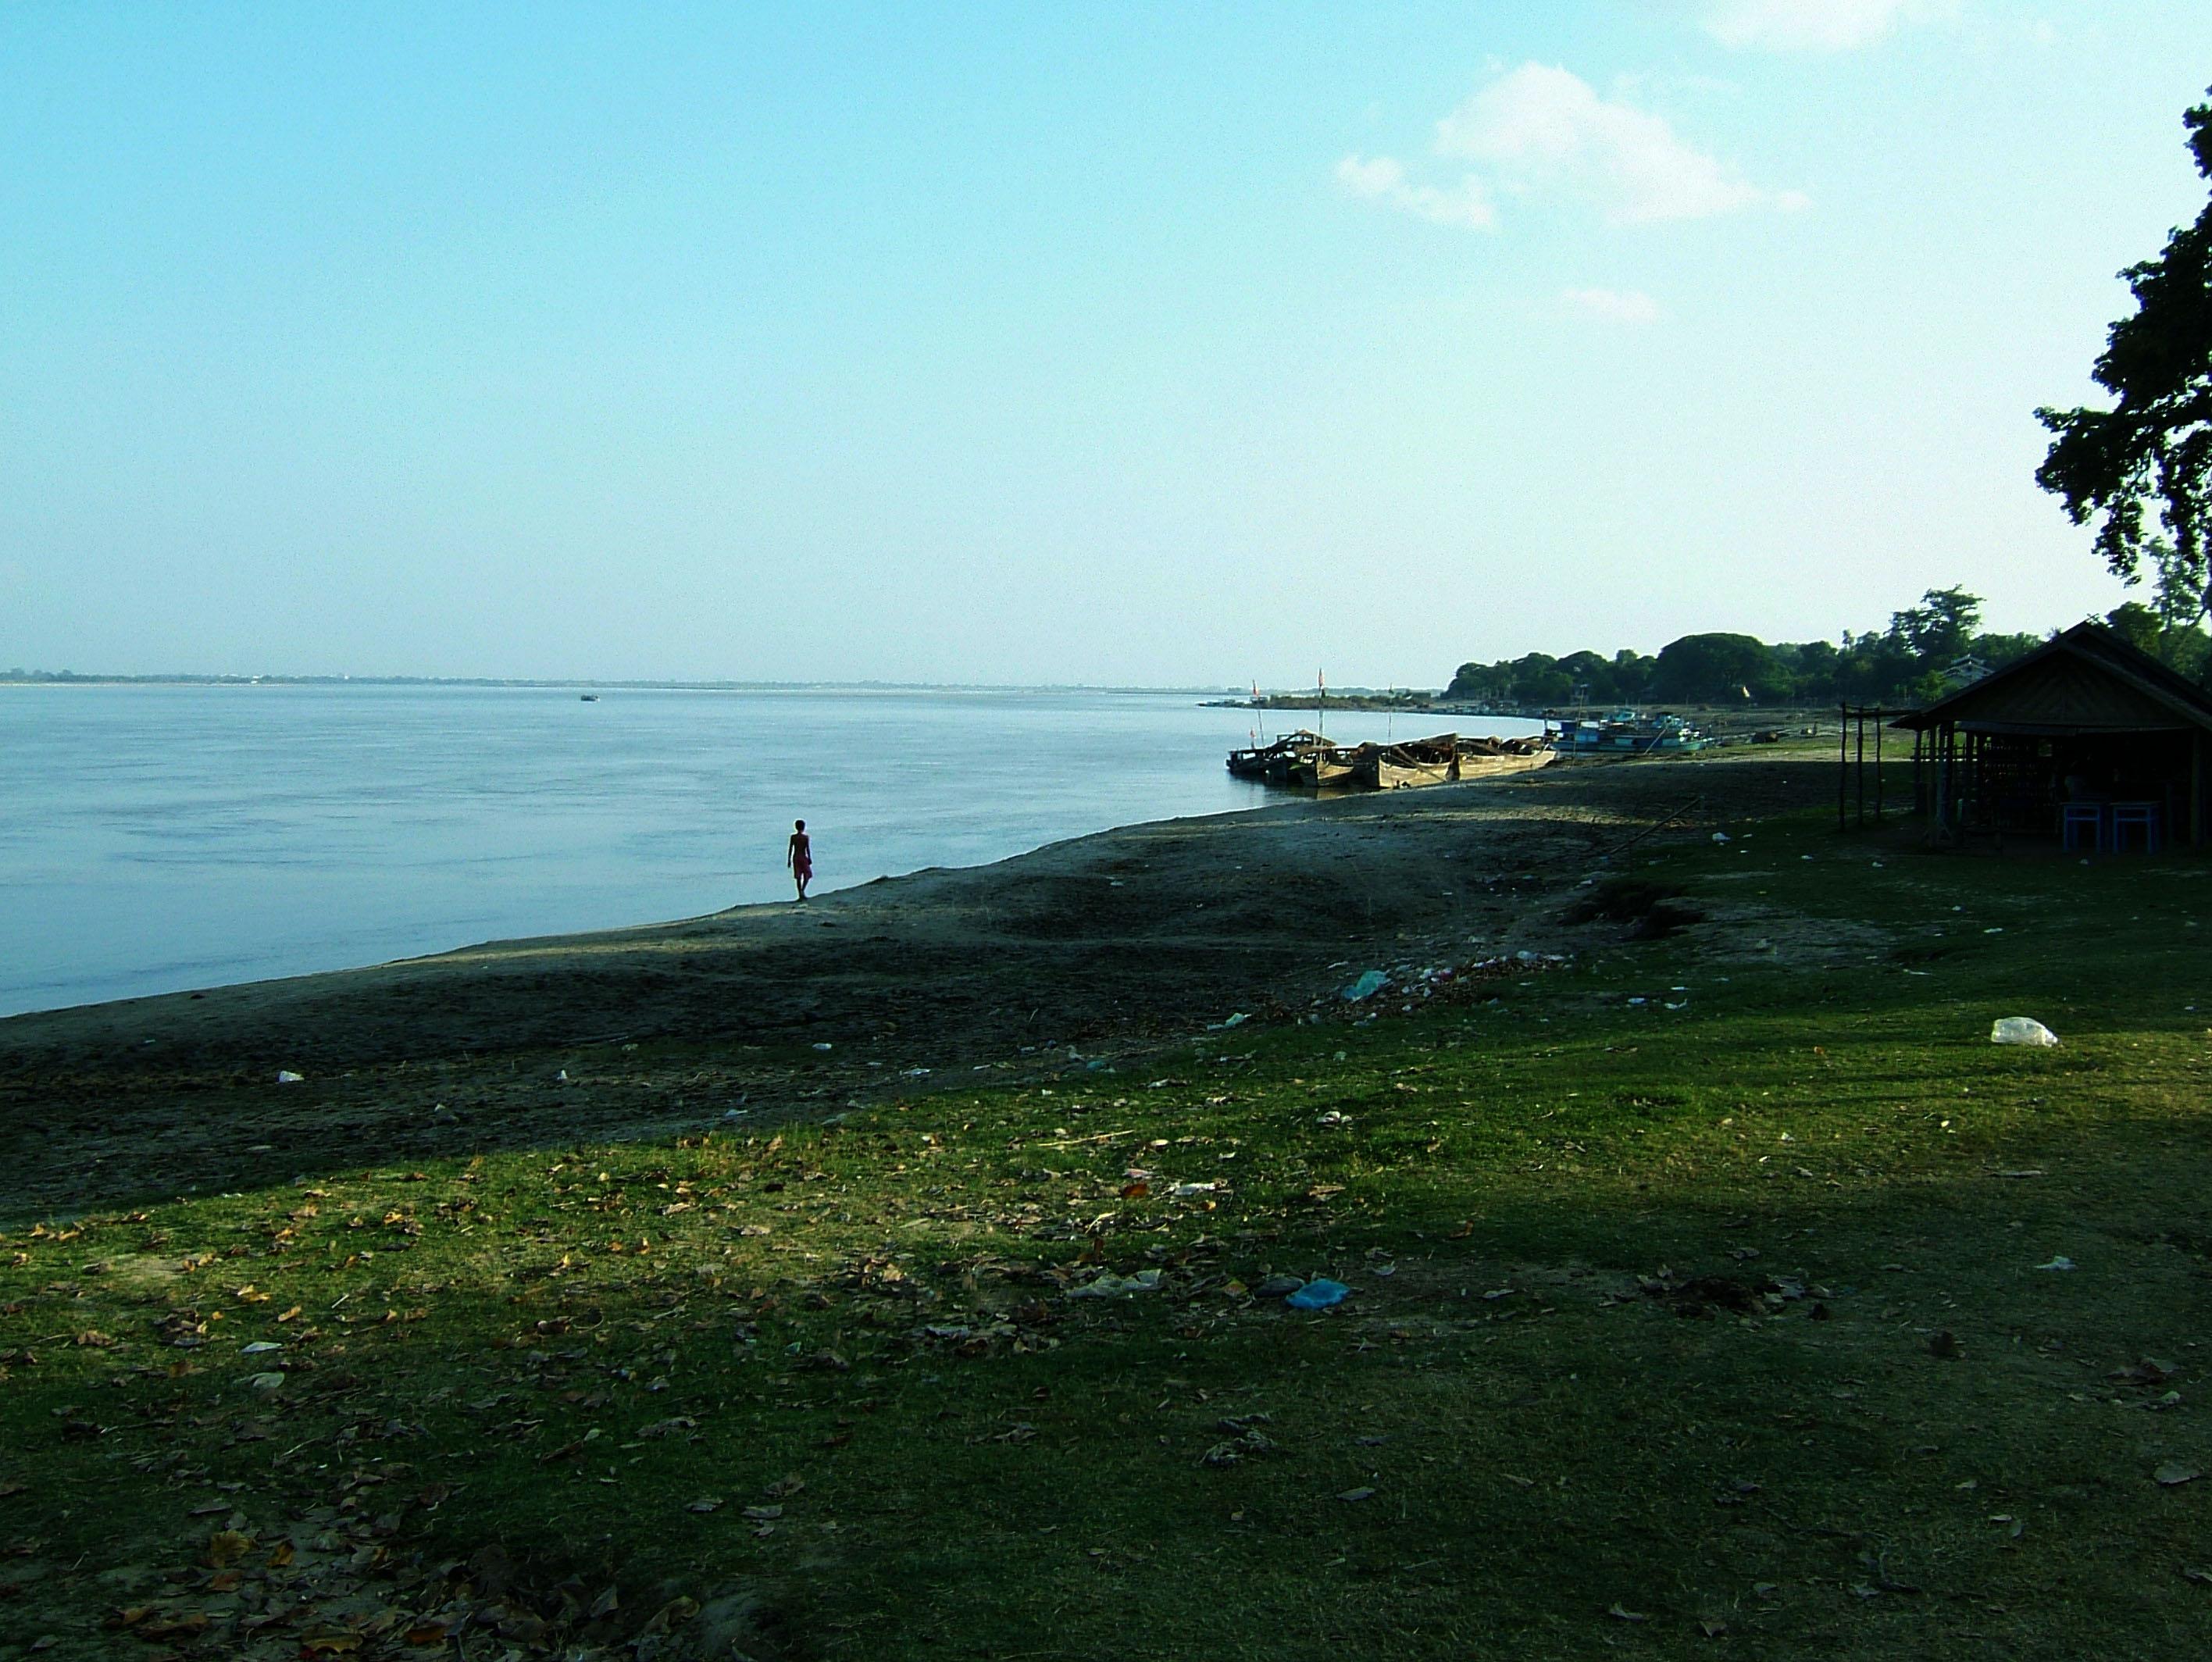 Ayeyarwaddy river scenes Mingun area Nov 2004 13